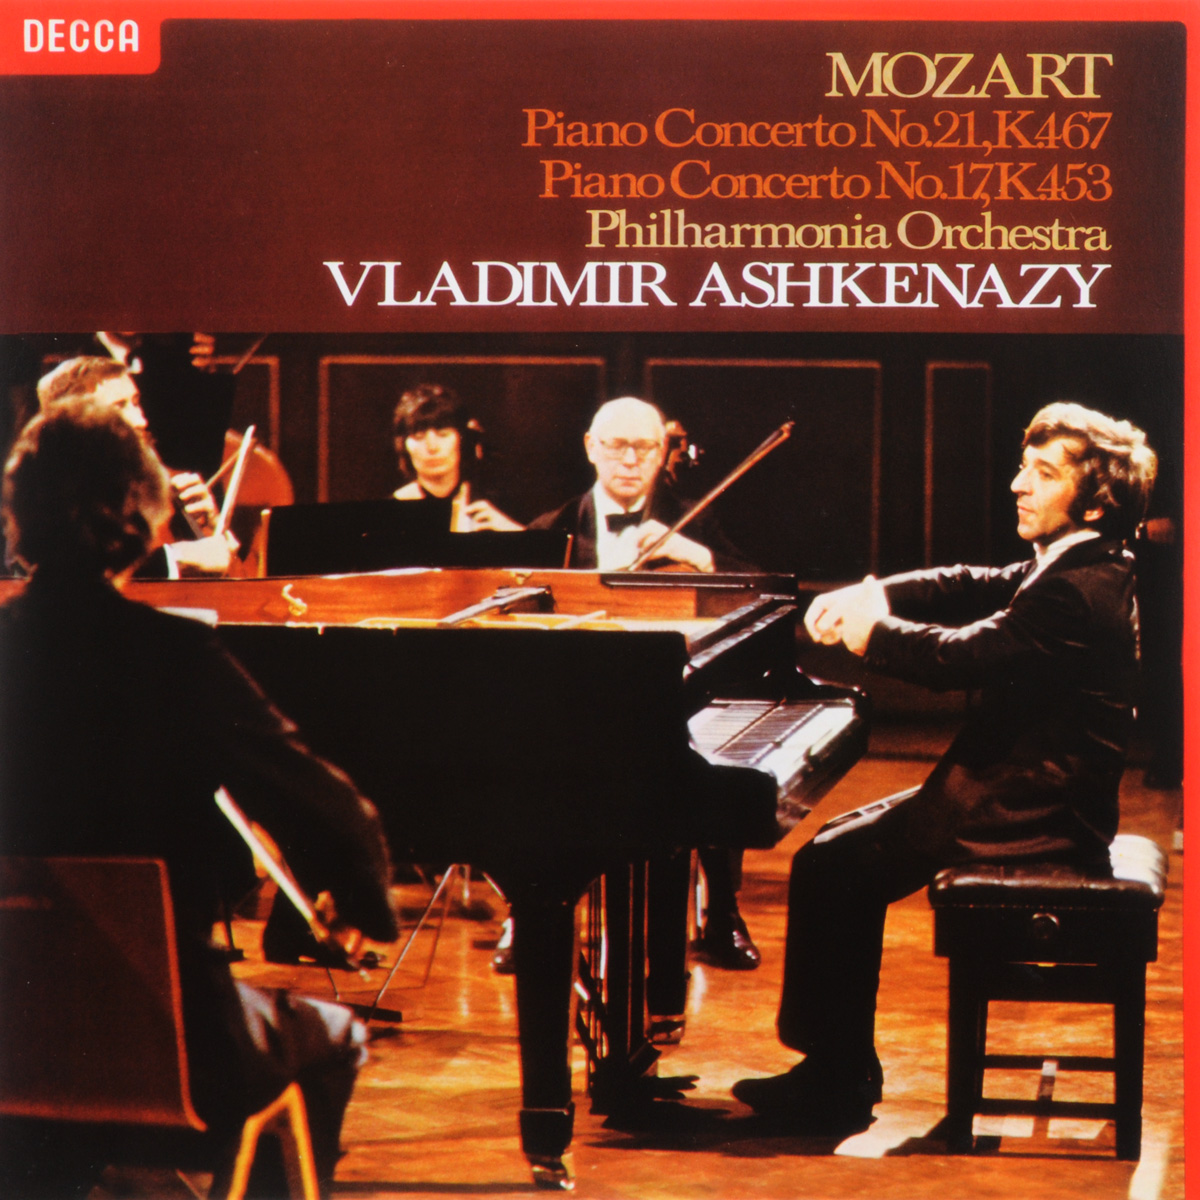 Владимир Ашкенази,Philharmonia Orchestra Vladimir Ashkenazy. Mozart. Piano Concertos Nos.17 & 21 (LP) vladimir ashkenazy beethoven the piano concertos 3 cd